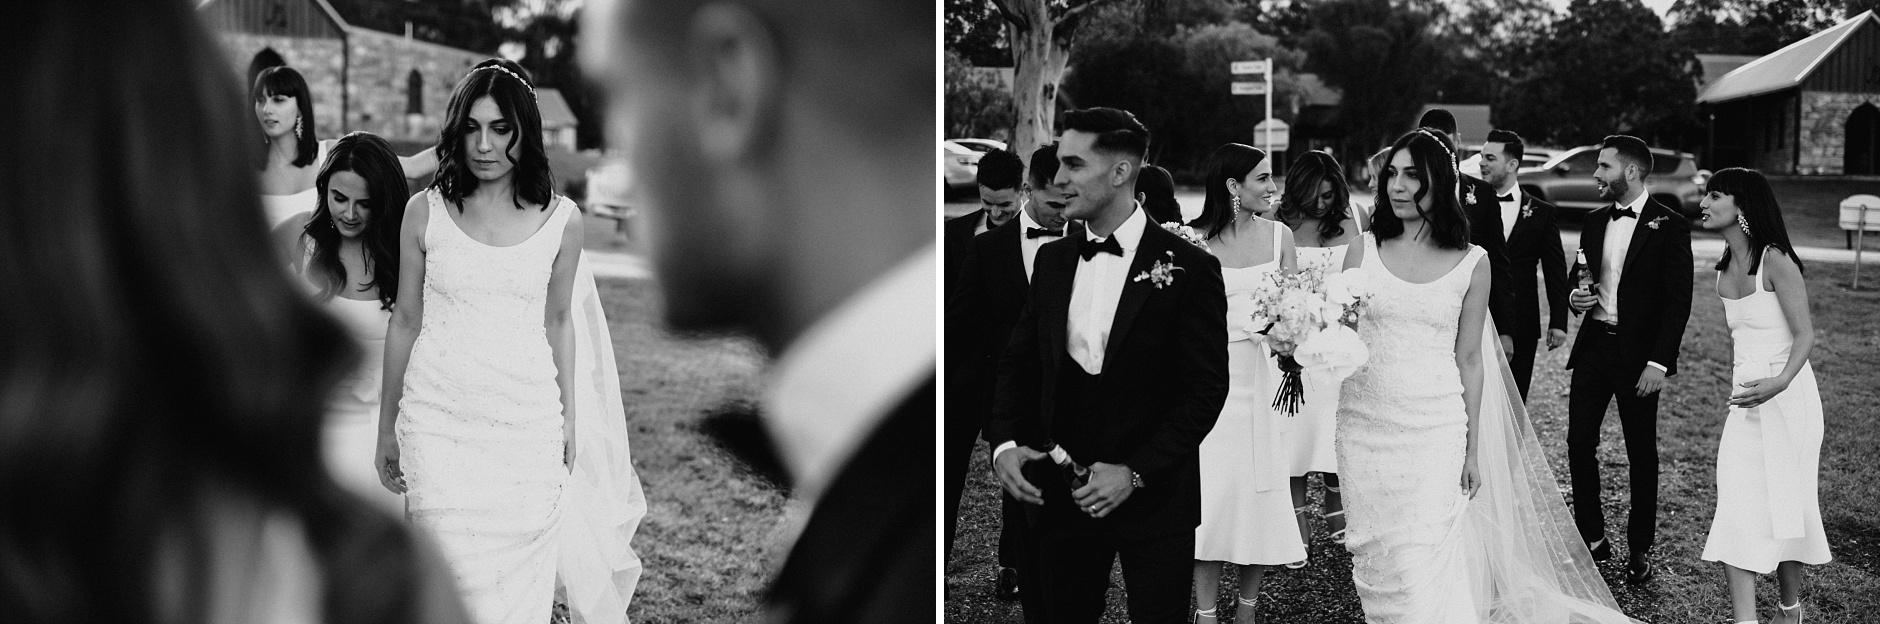 cassandra&cameron0613ab_Peppers-Creek-Wedding.jpg